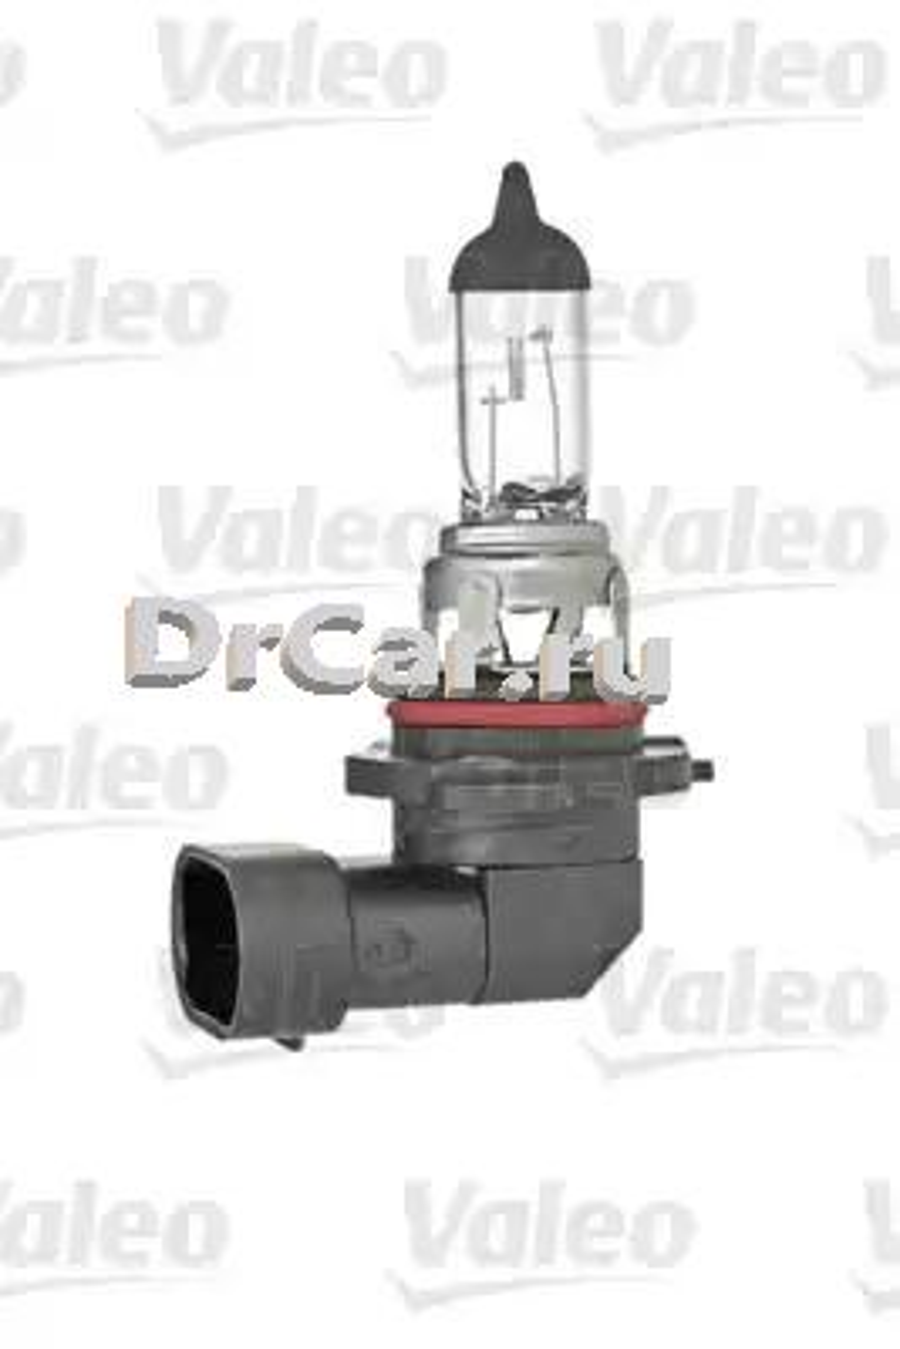 VALEO 032015 Лампа HB4 12V 51W p22d Essential